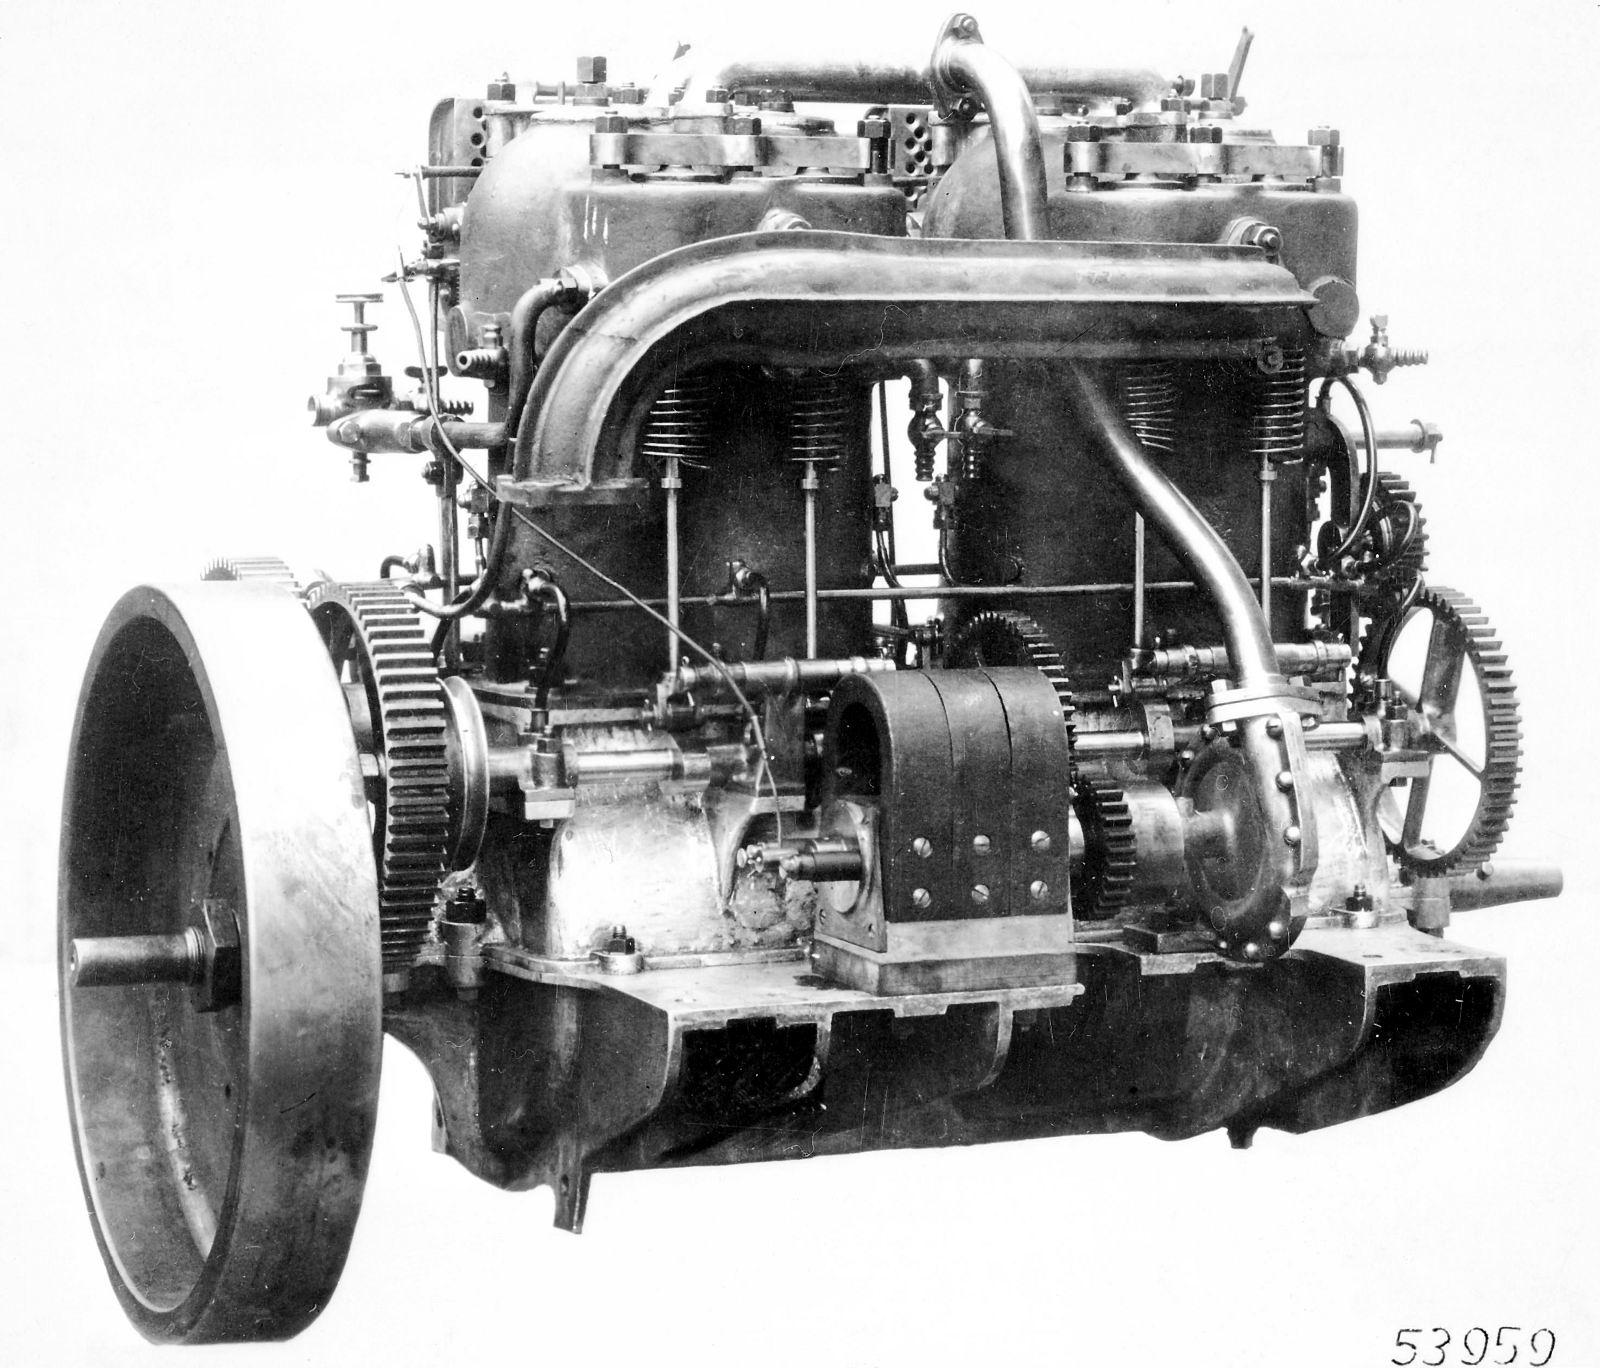 vierzylindermotor-jpg.4049